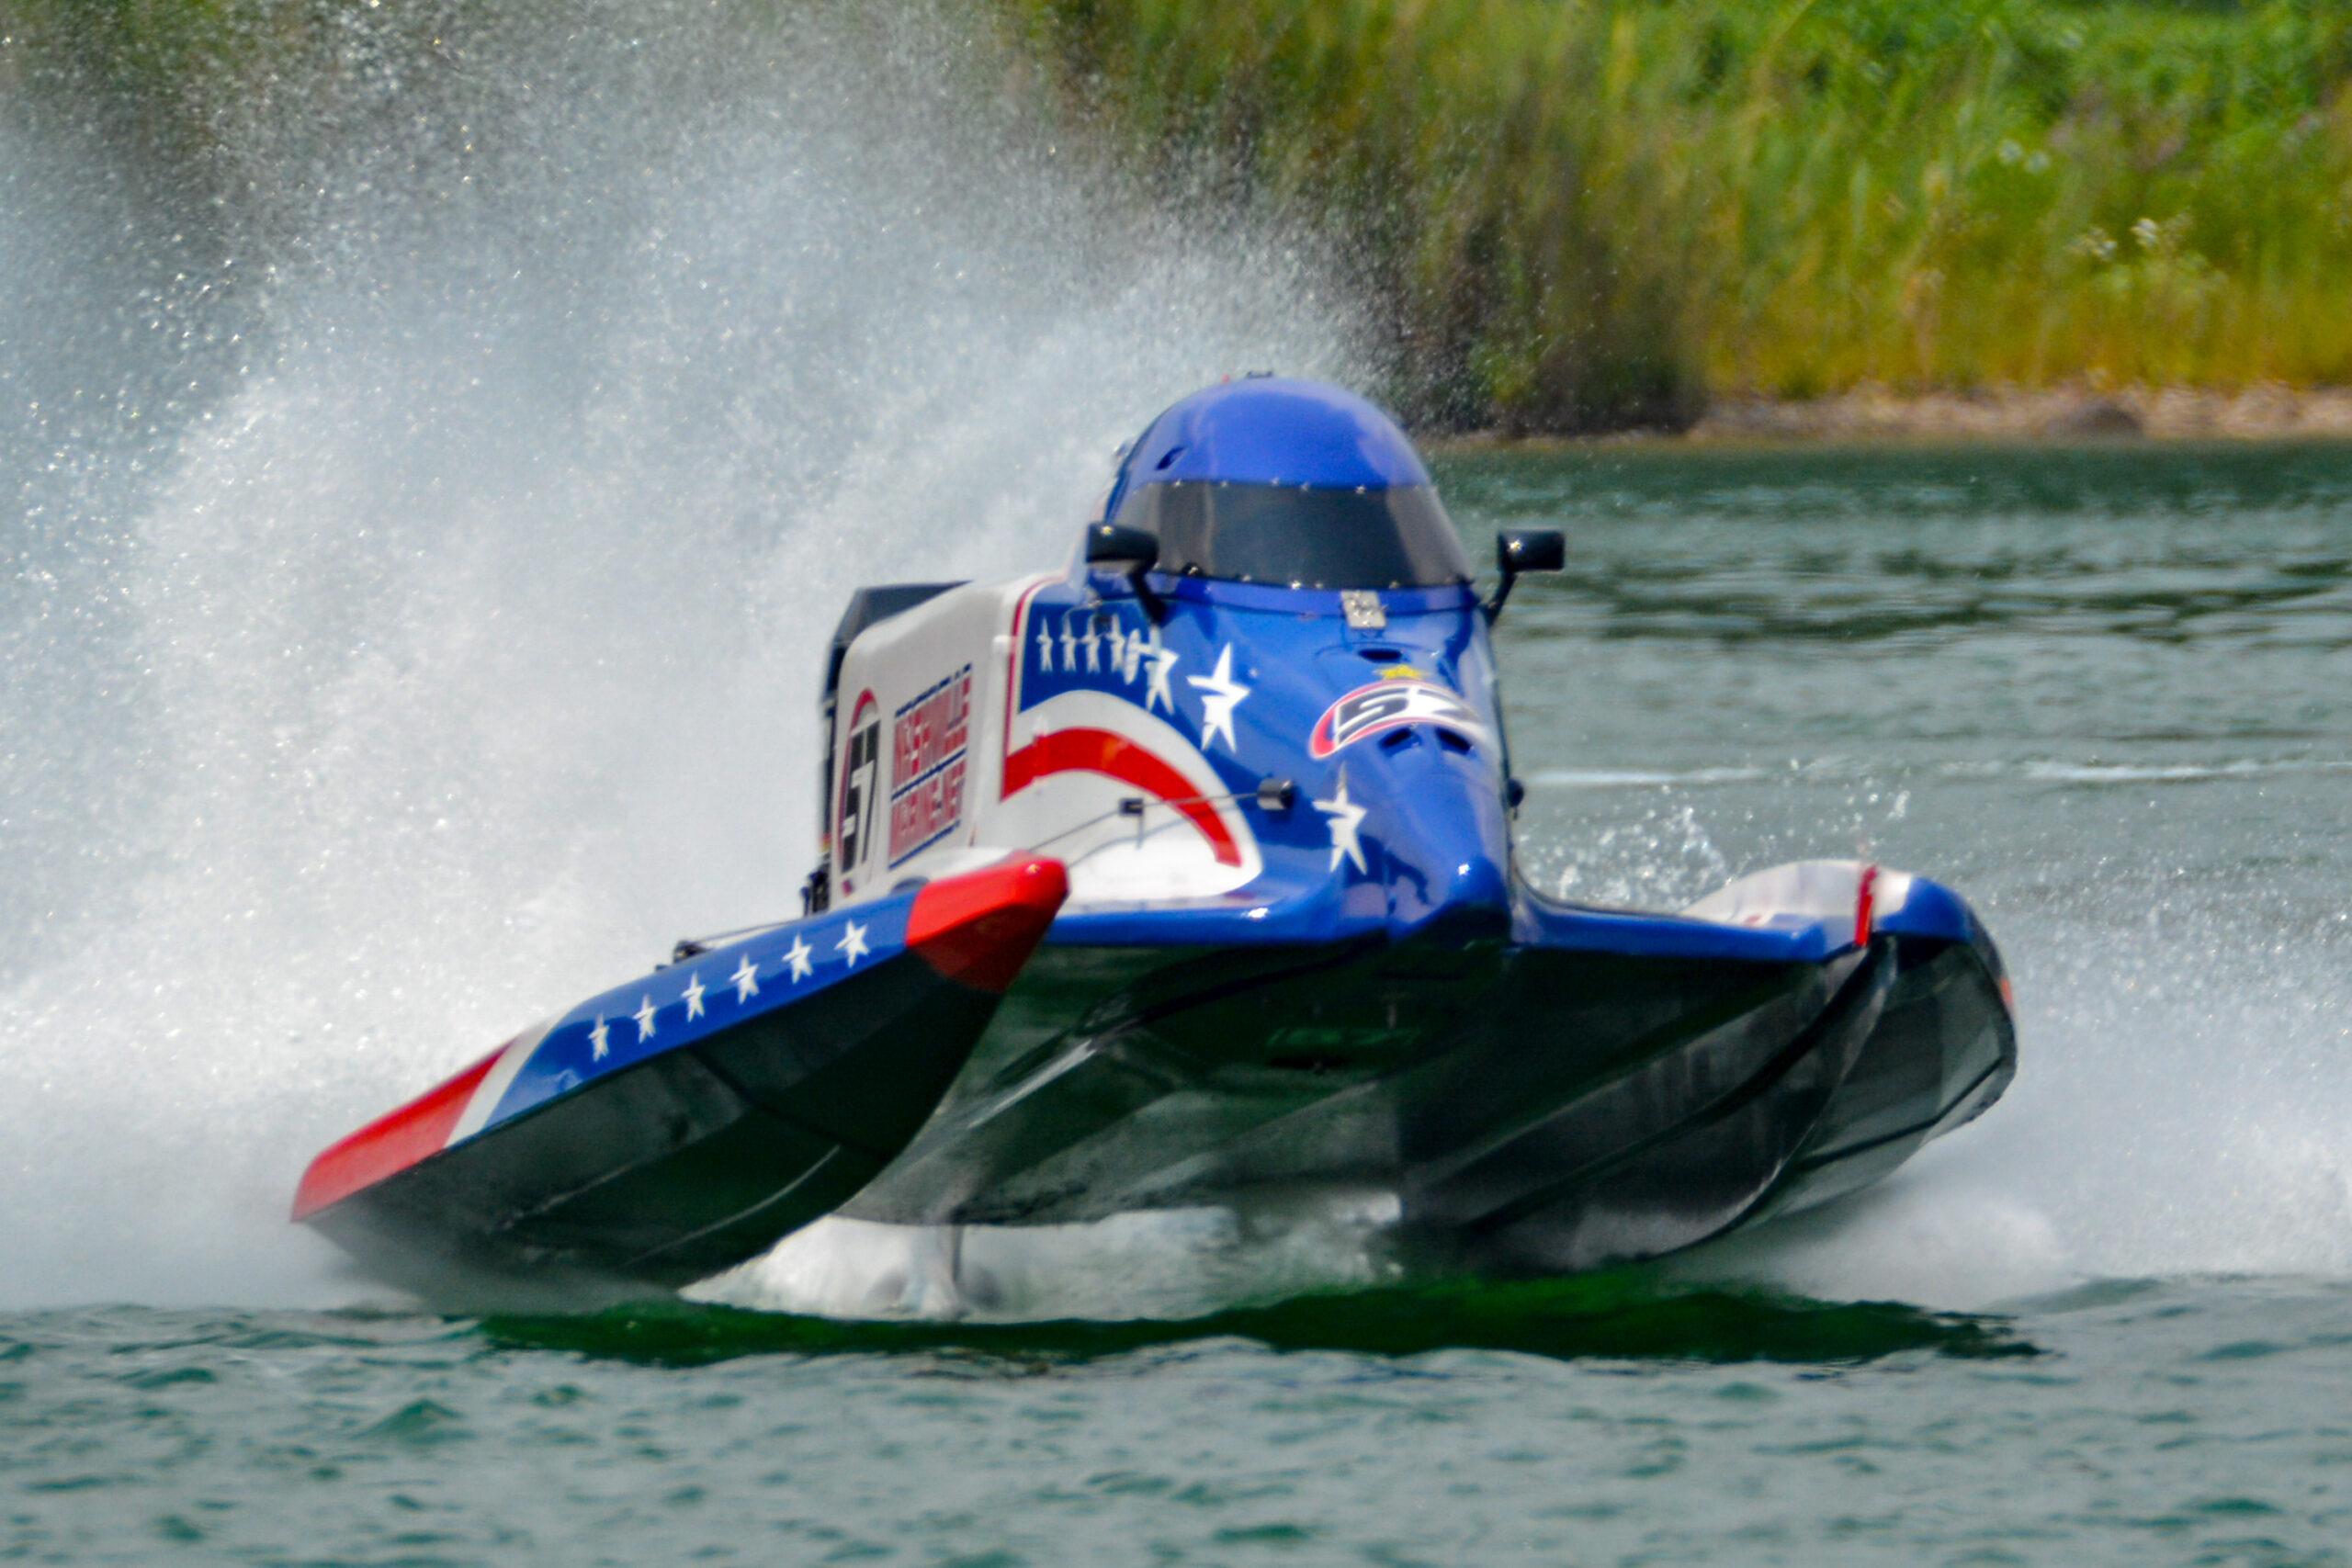 McMurray Racing Nashville Marine 2021 Springfield F1 Race-20